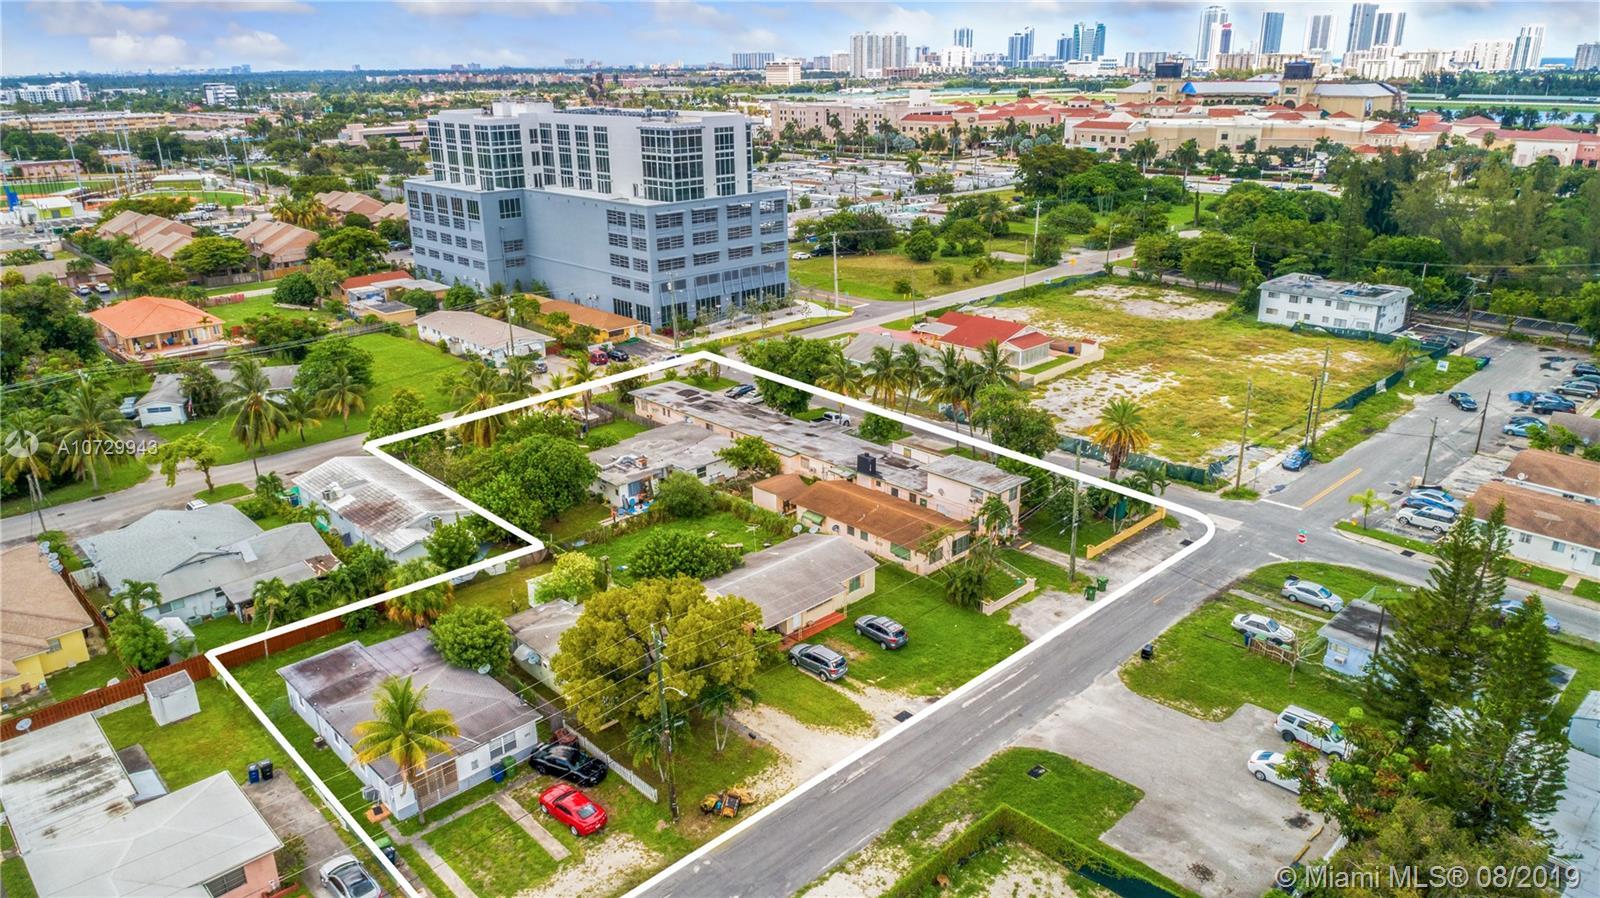 228 SE 9 St, Unit #1-8 Luxury Real Estate